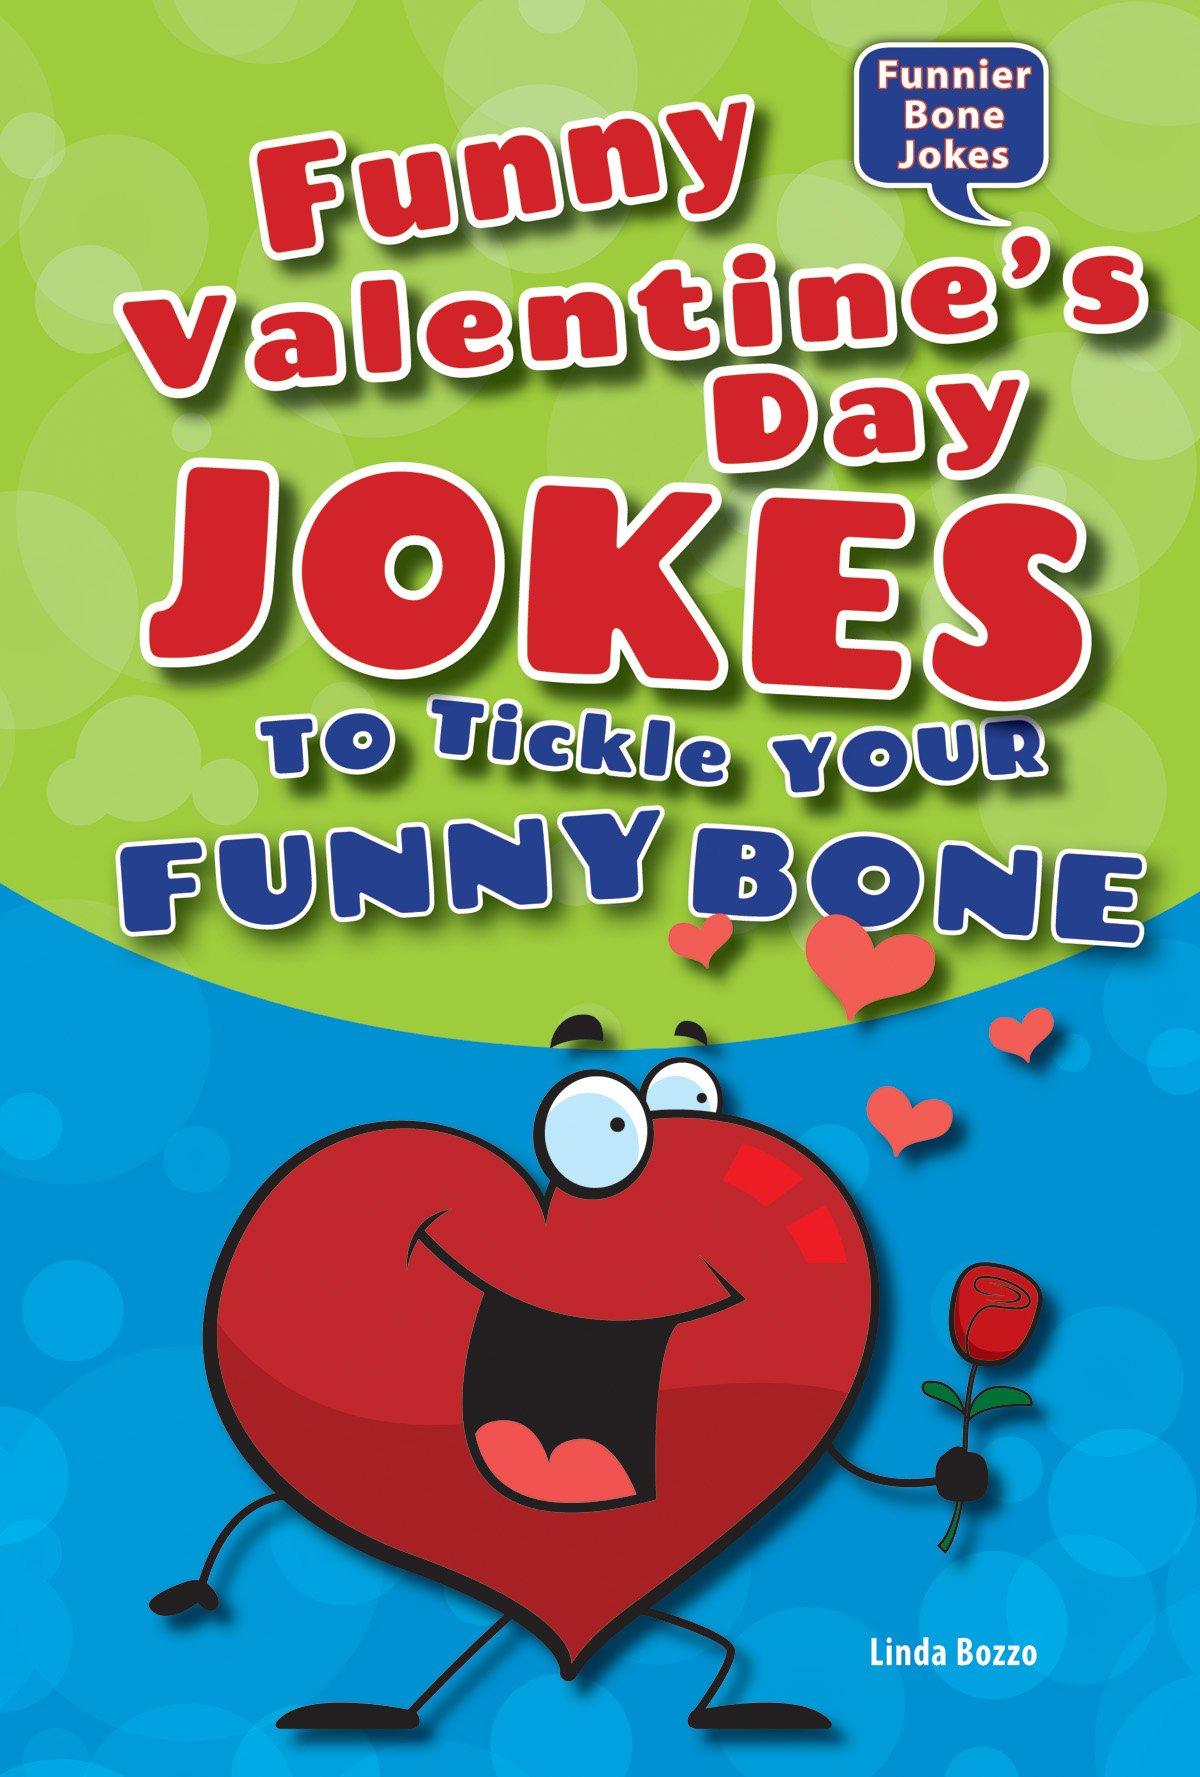 funny valentines day jokes to tickle your funny bone funnier bone jokes linda bozzo 9781464401770 amazoncom books - Valentine Jokes Funny